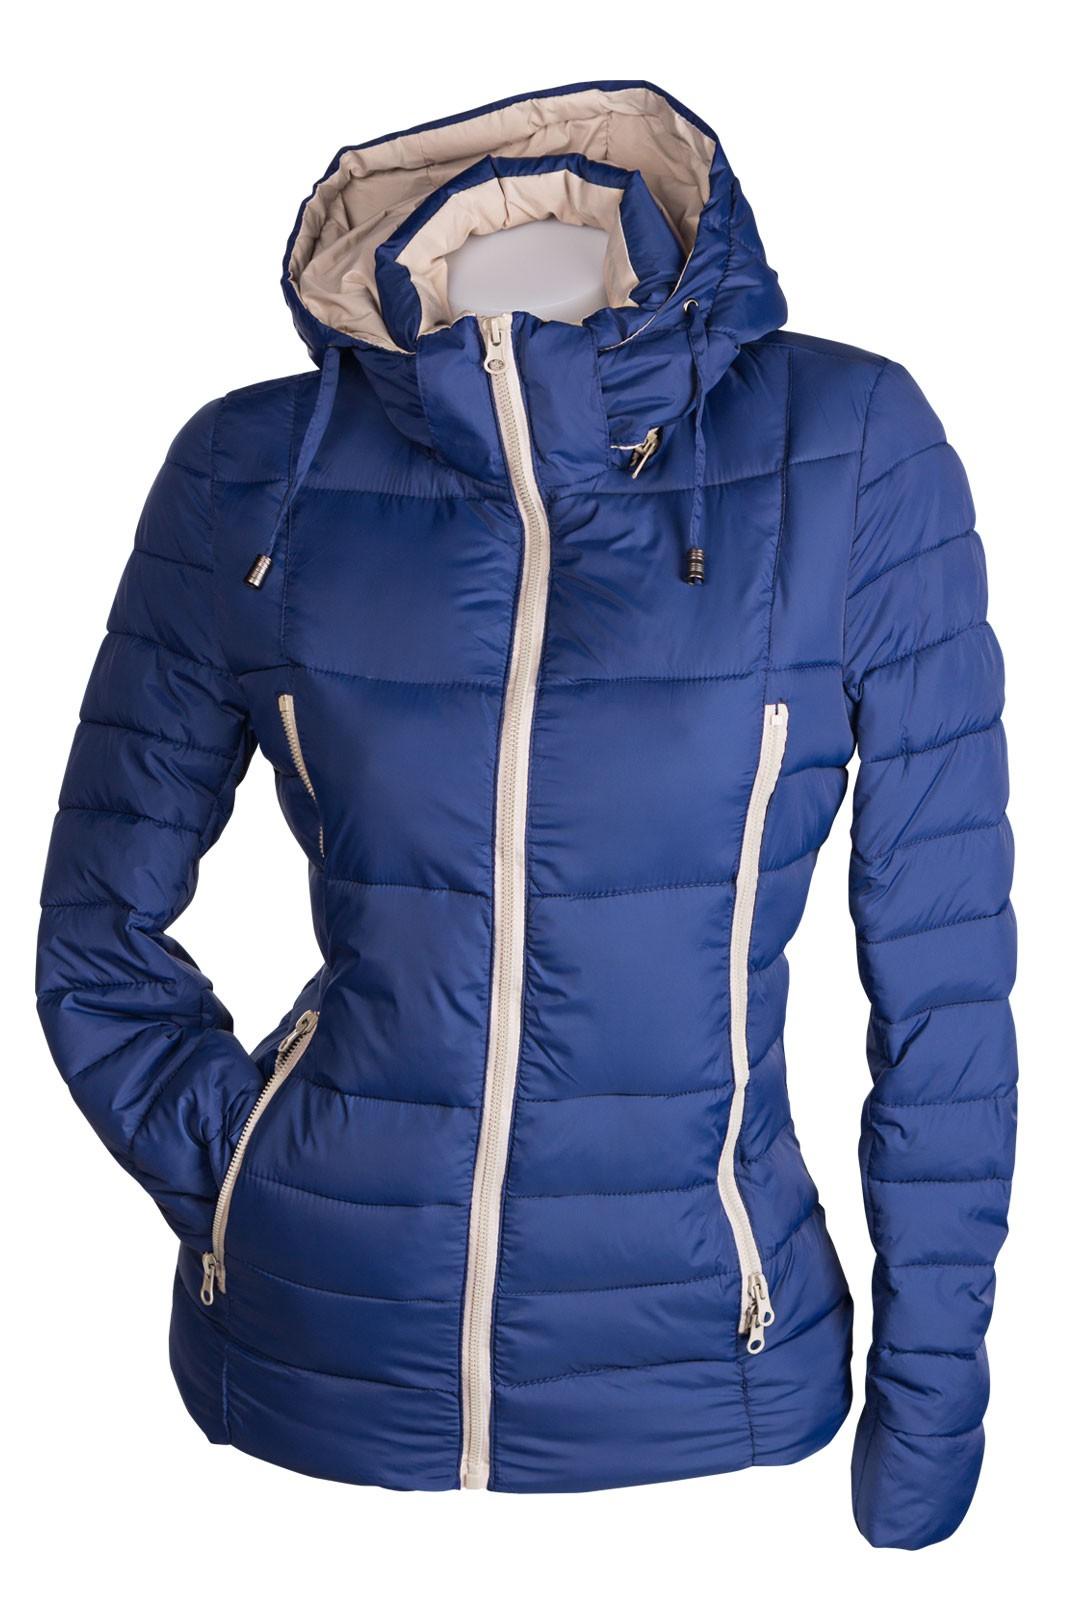 sportliche damen fr lingsjacke mit kapuze daunen optik skijacke damen mode jacken. Black Bedroom Furniture Sets. Home Design Ideas